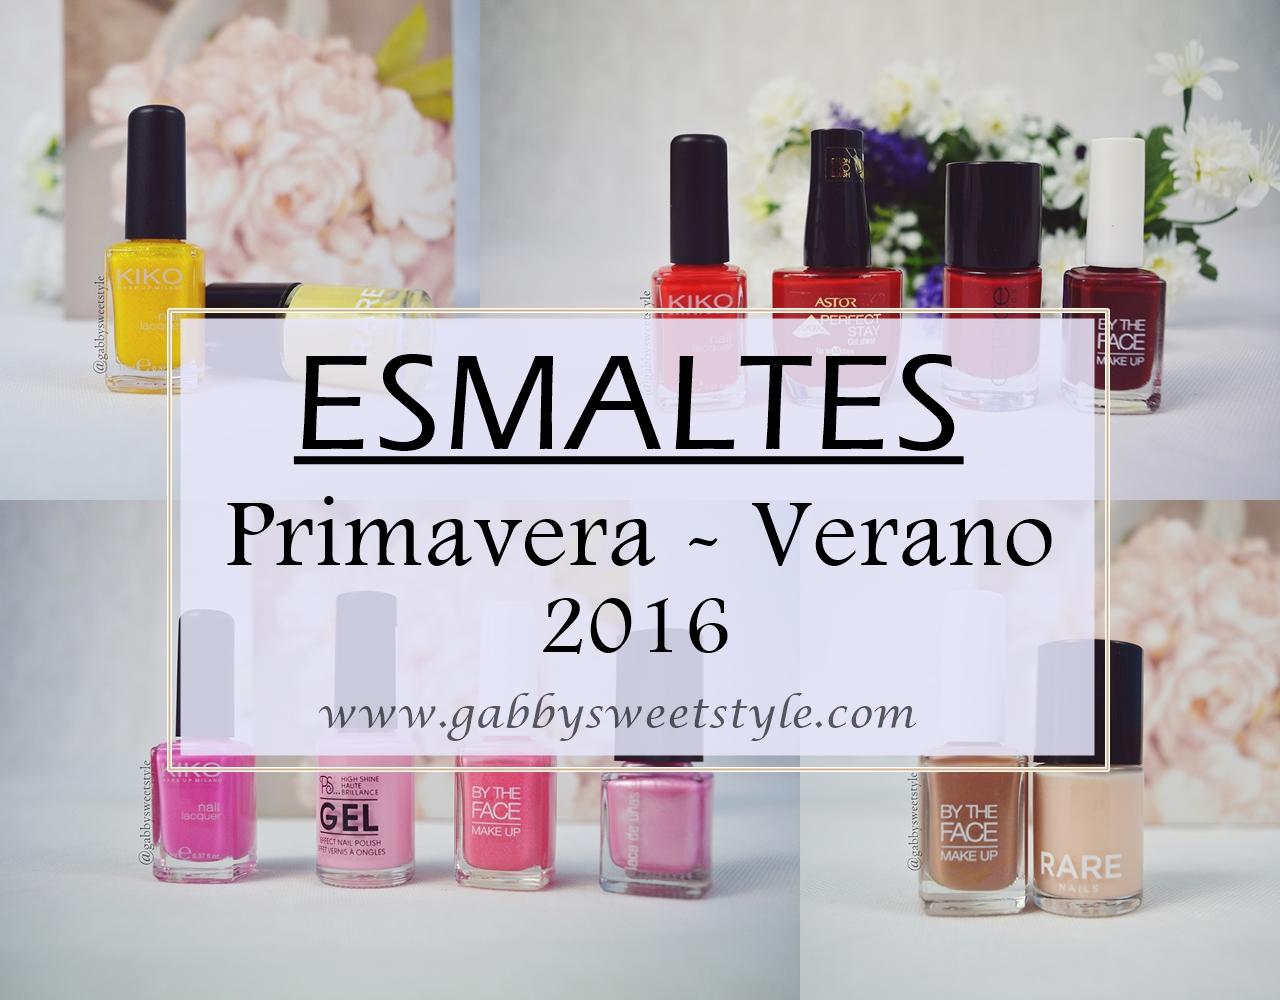 Tendencia: Esmaltes Primavera-Verano 2016